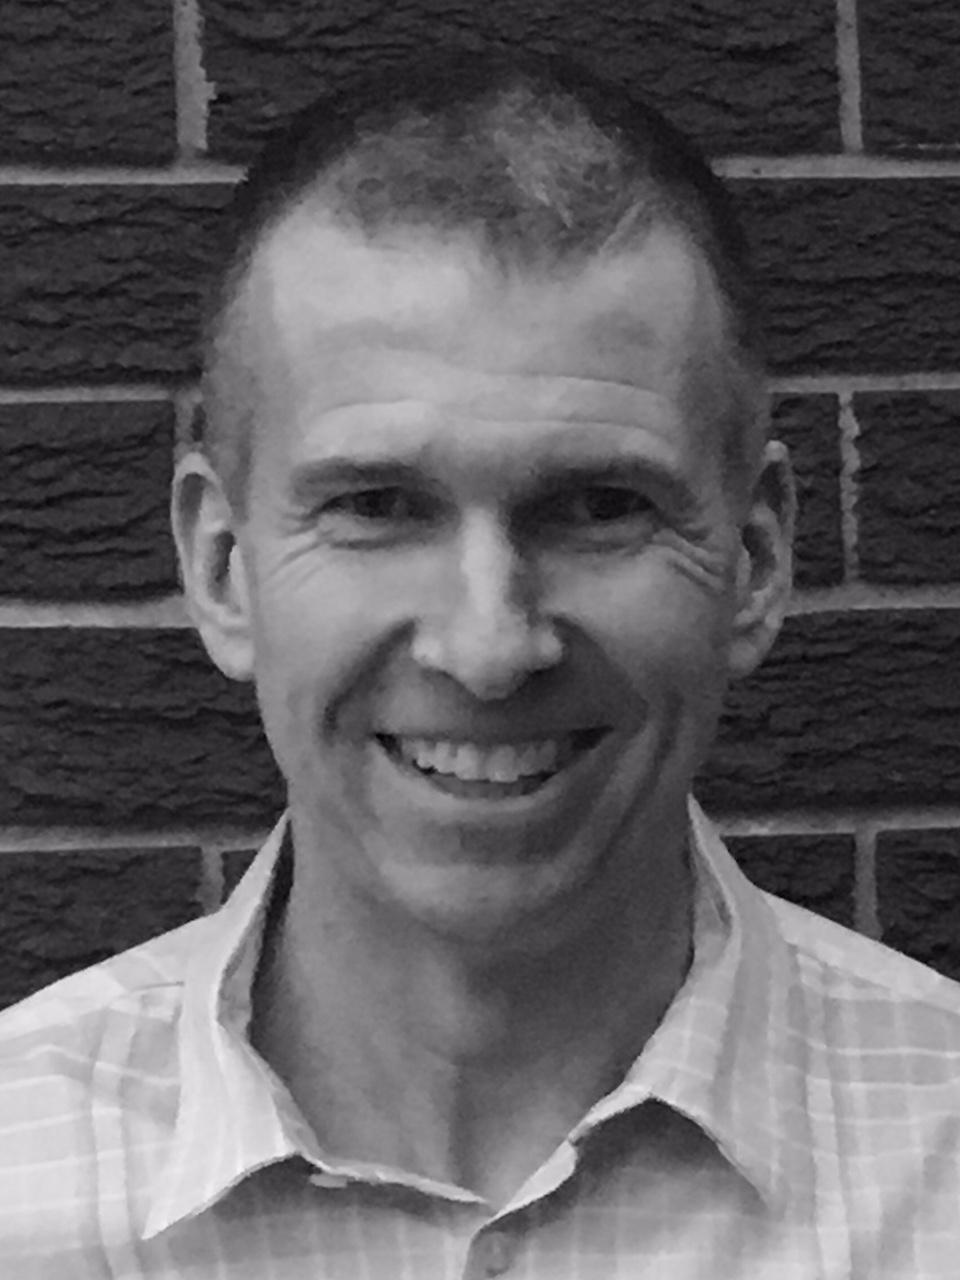 John Mogk, Directeur de l'exploitation